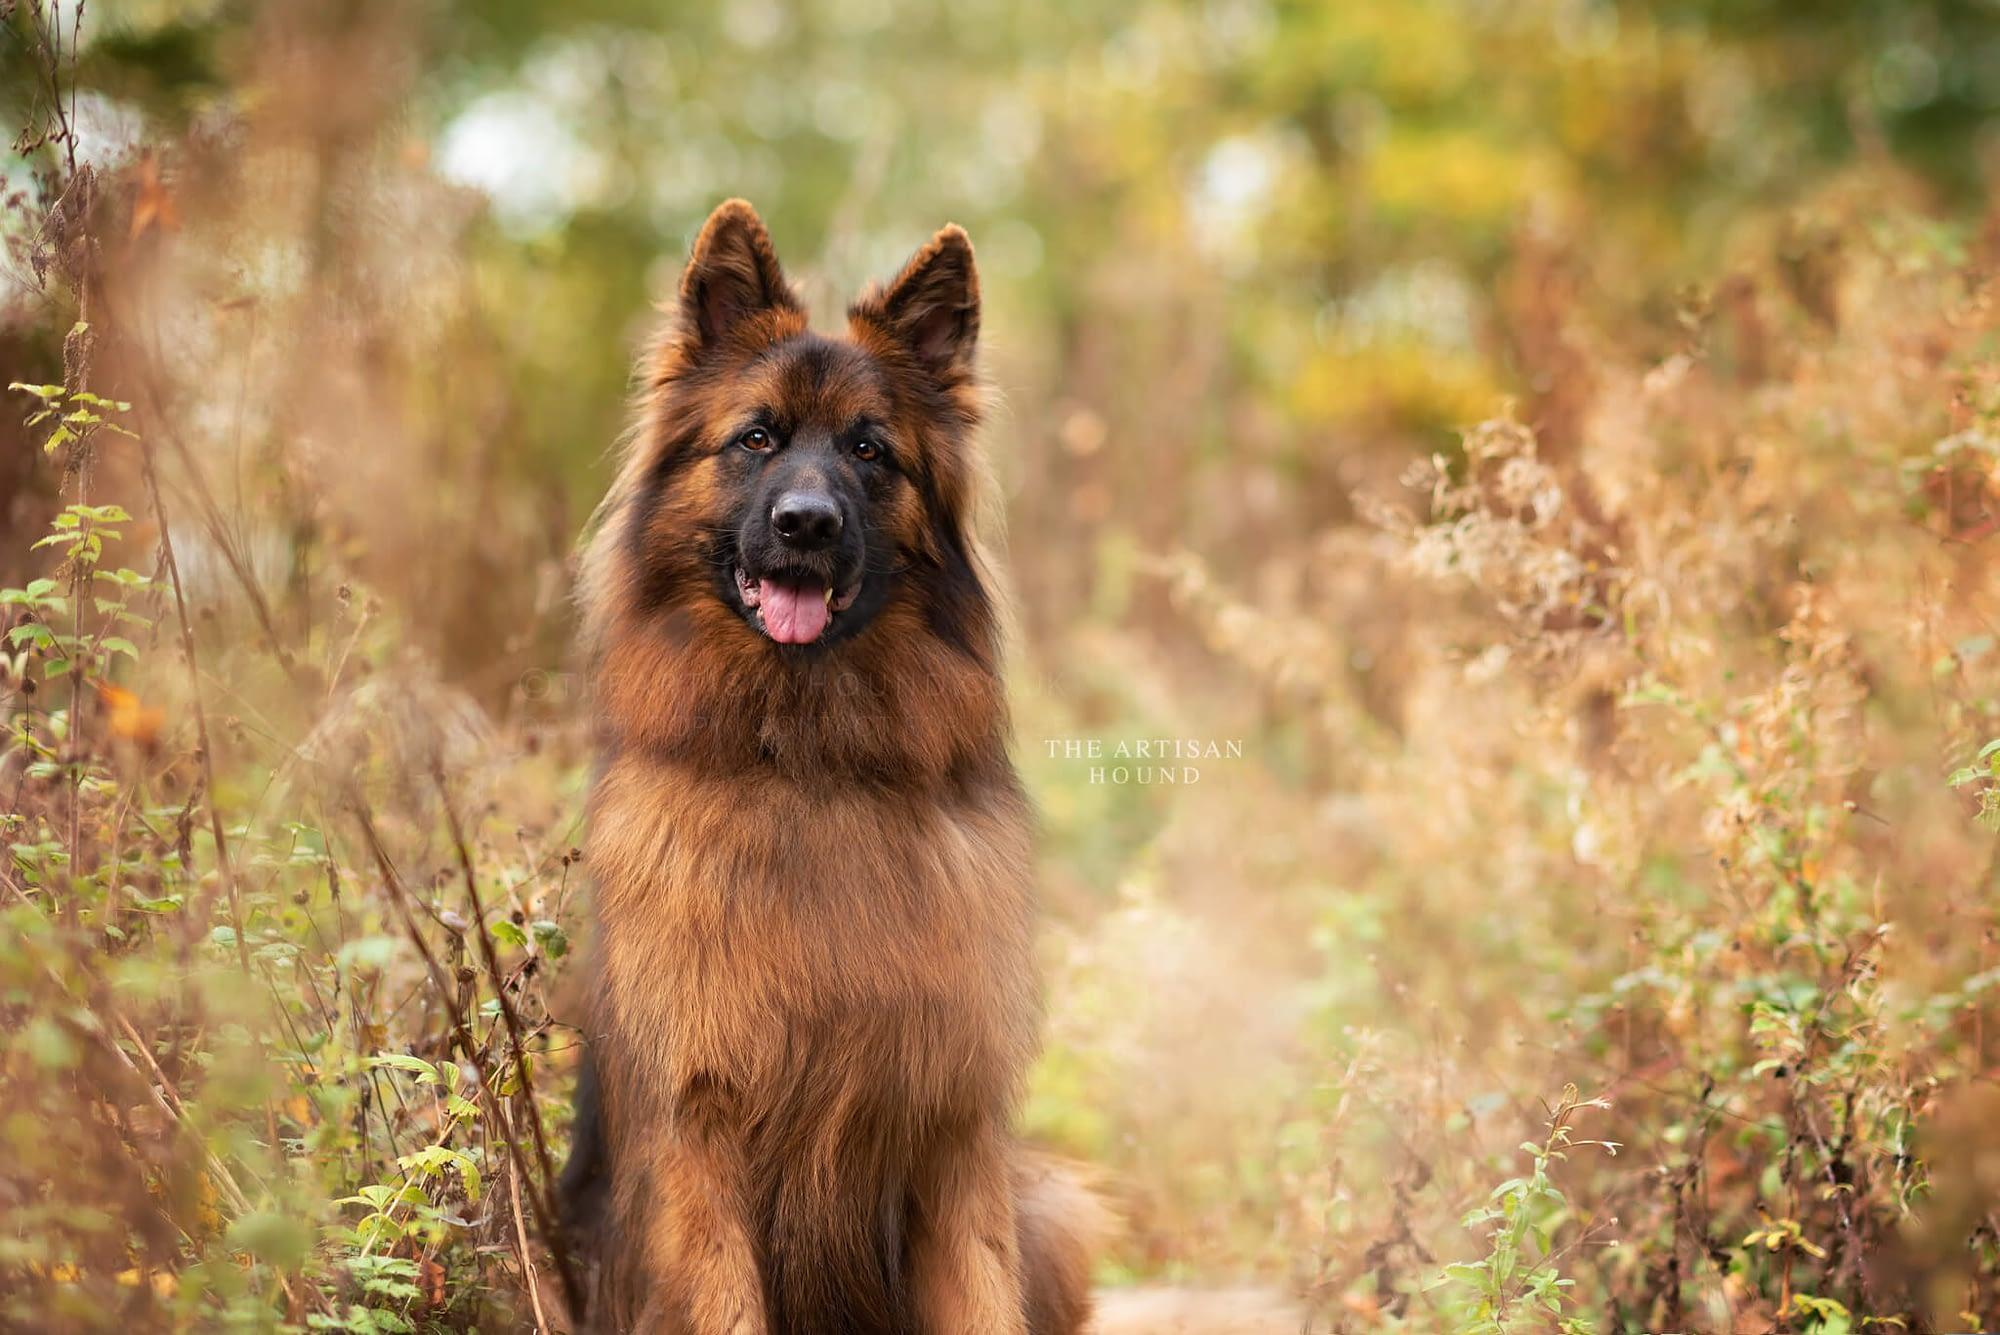 German Shepherd dog sitting in tall grass in Northampton park